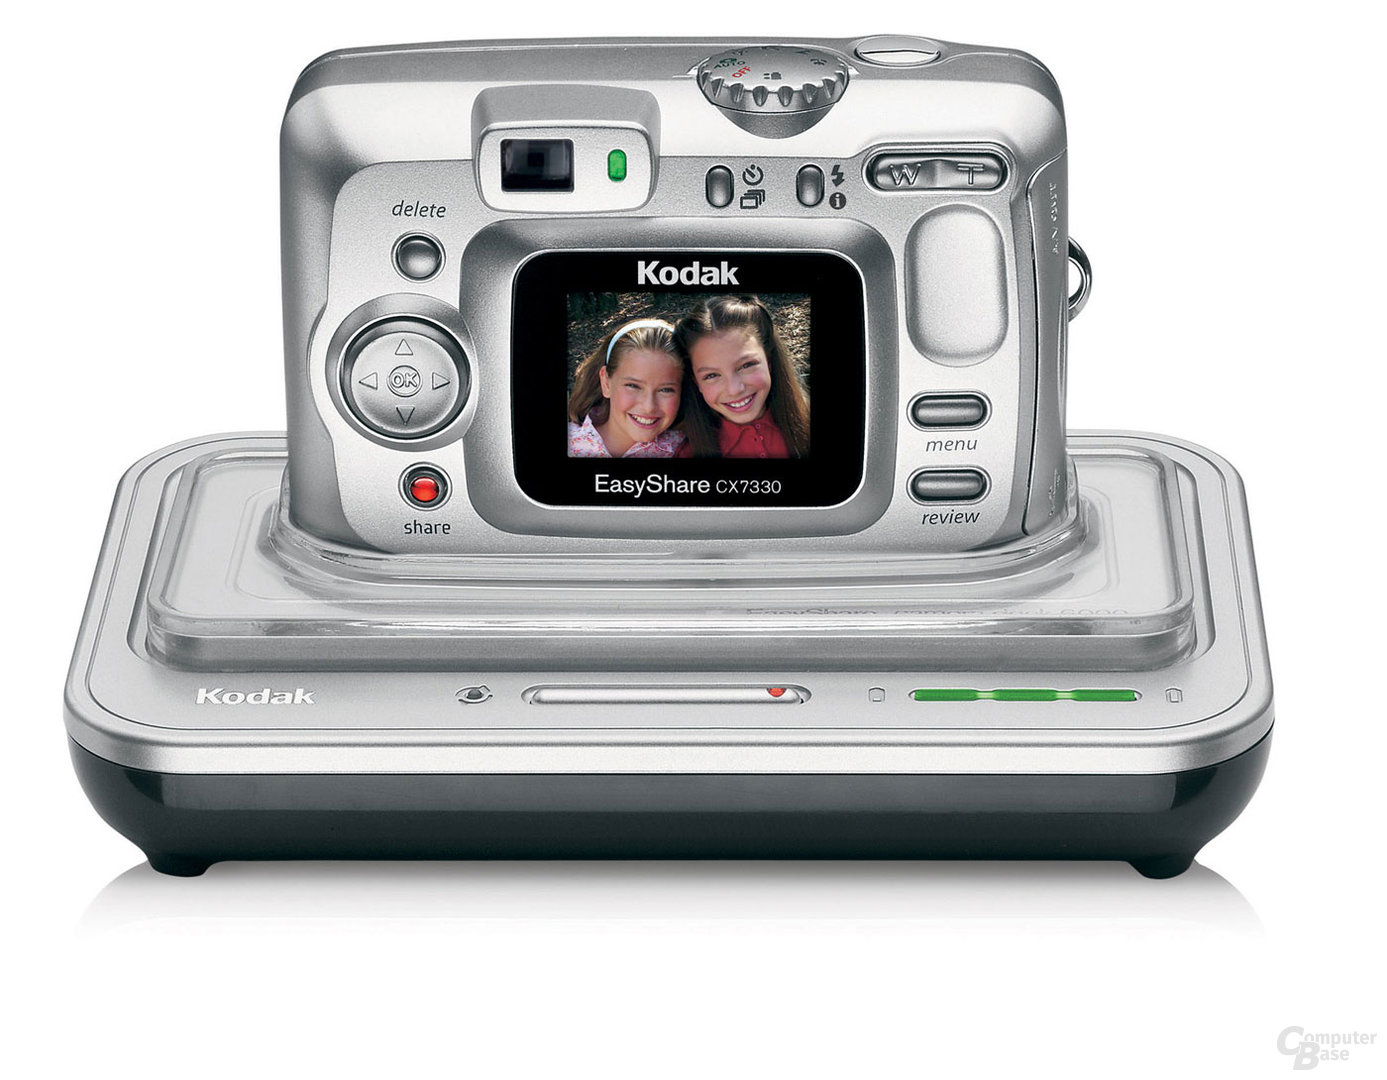 Kodak EasyShare CX7330 mit EasyShare Kamerastationen